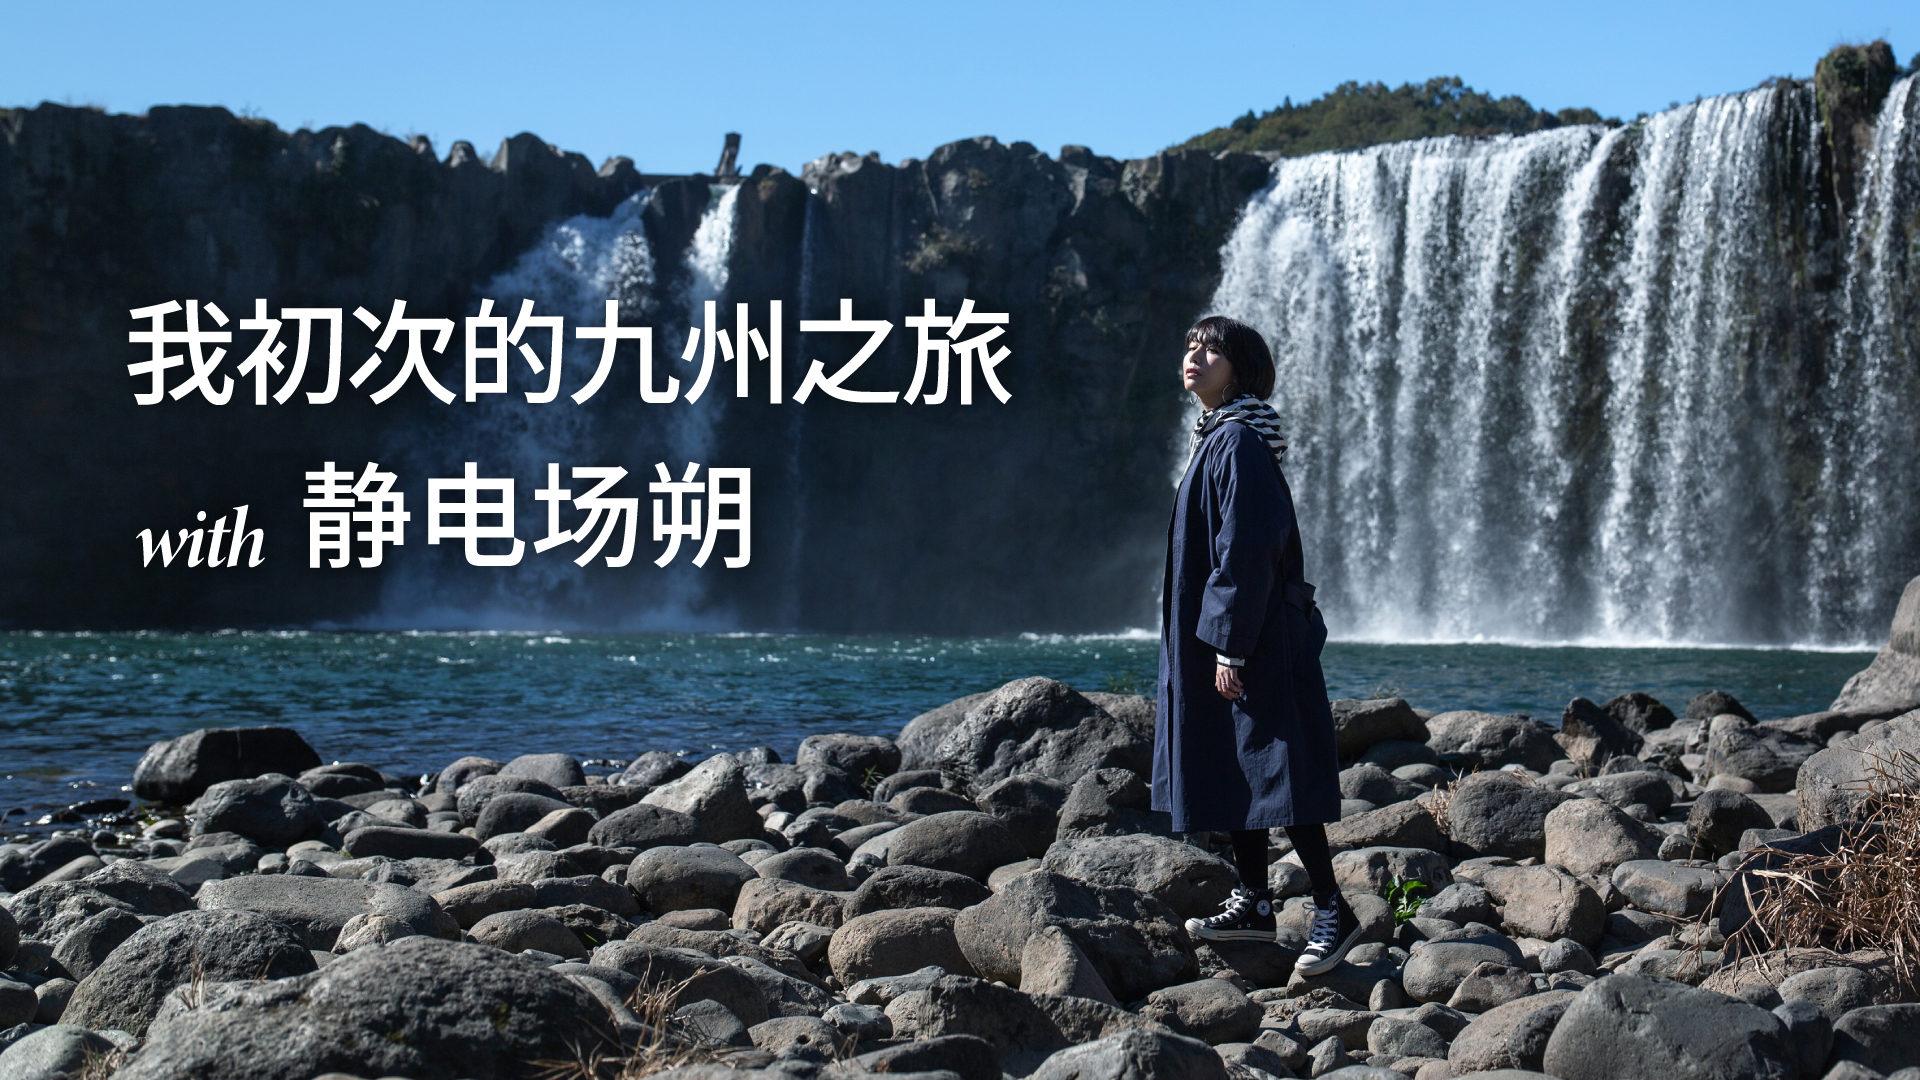 Kyushu Promotion